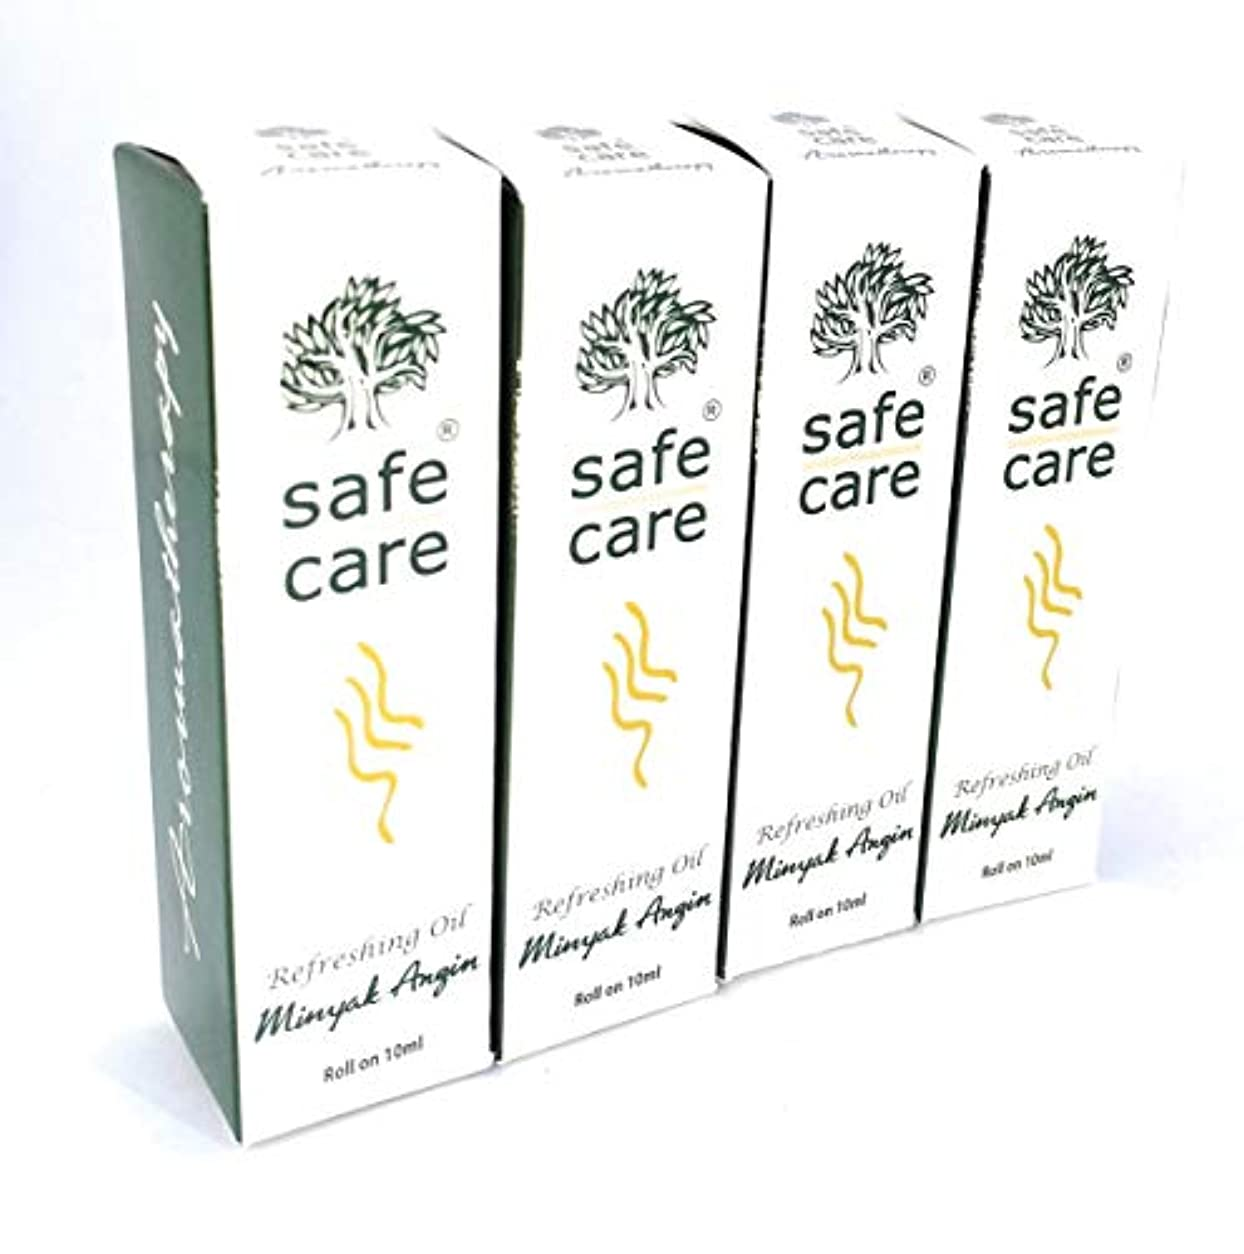 Safe Care セイフケア Aromatherapy Refreshing Oil アロマテラピー リフレッシュオイル ロールオン 10ml × 4本セット [並行輸入品][海外直送品]